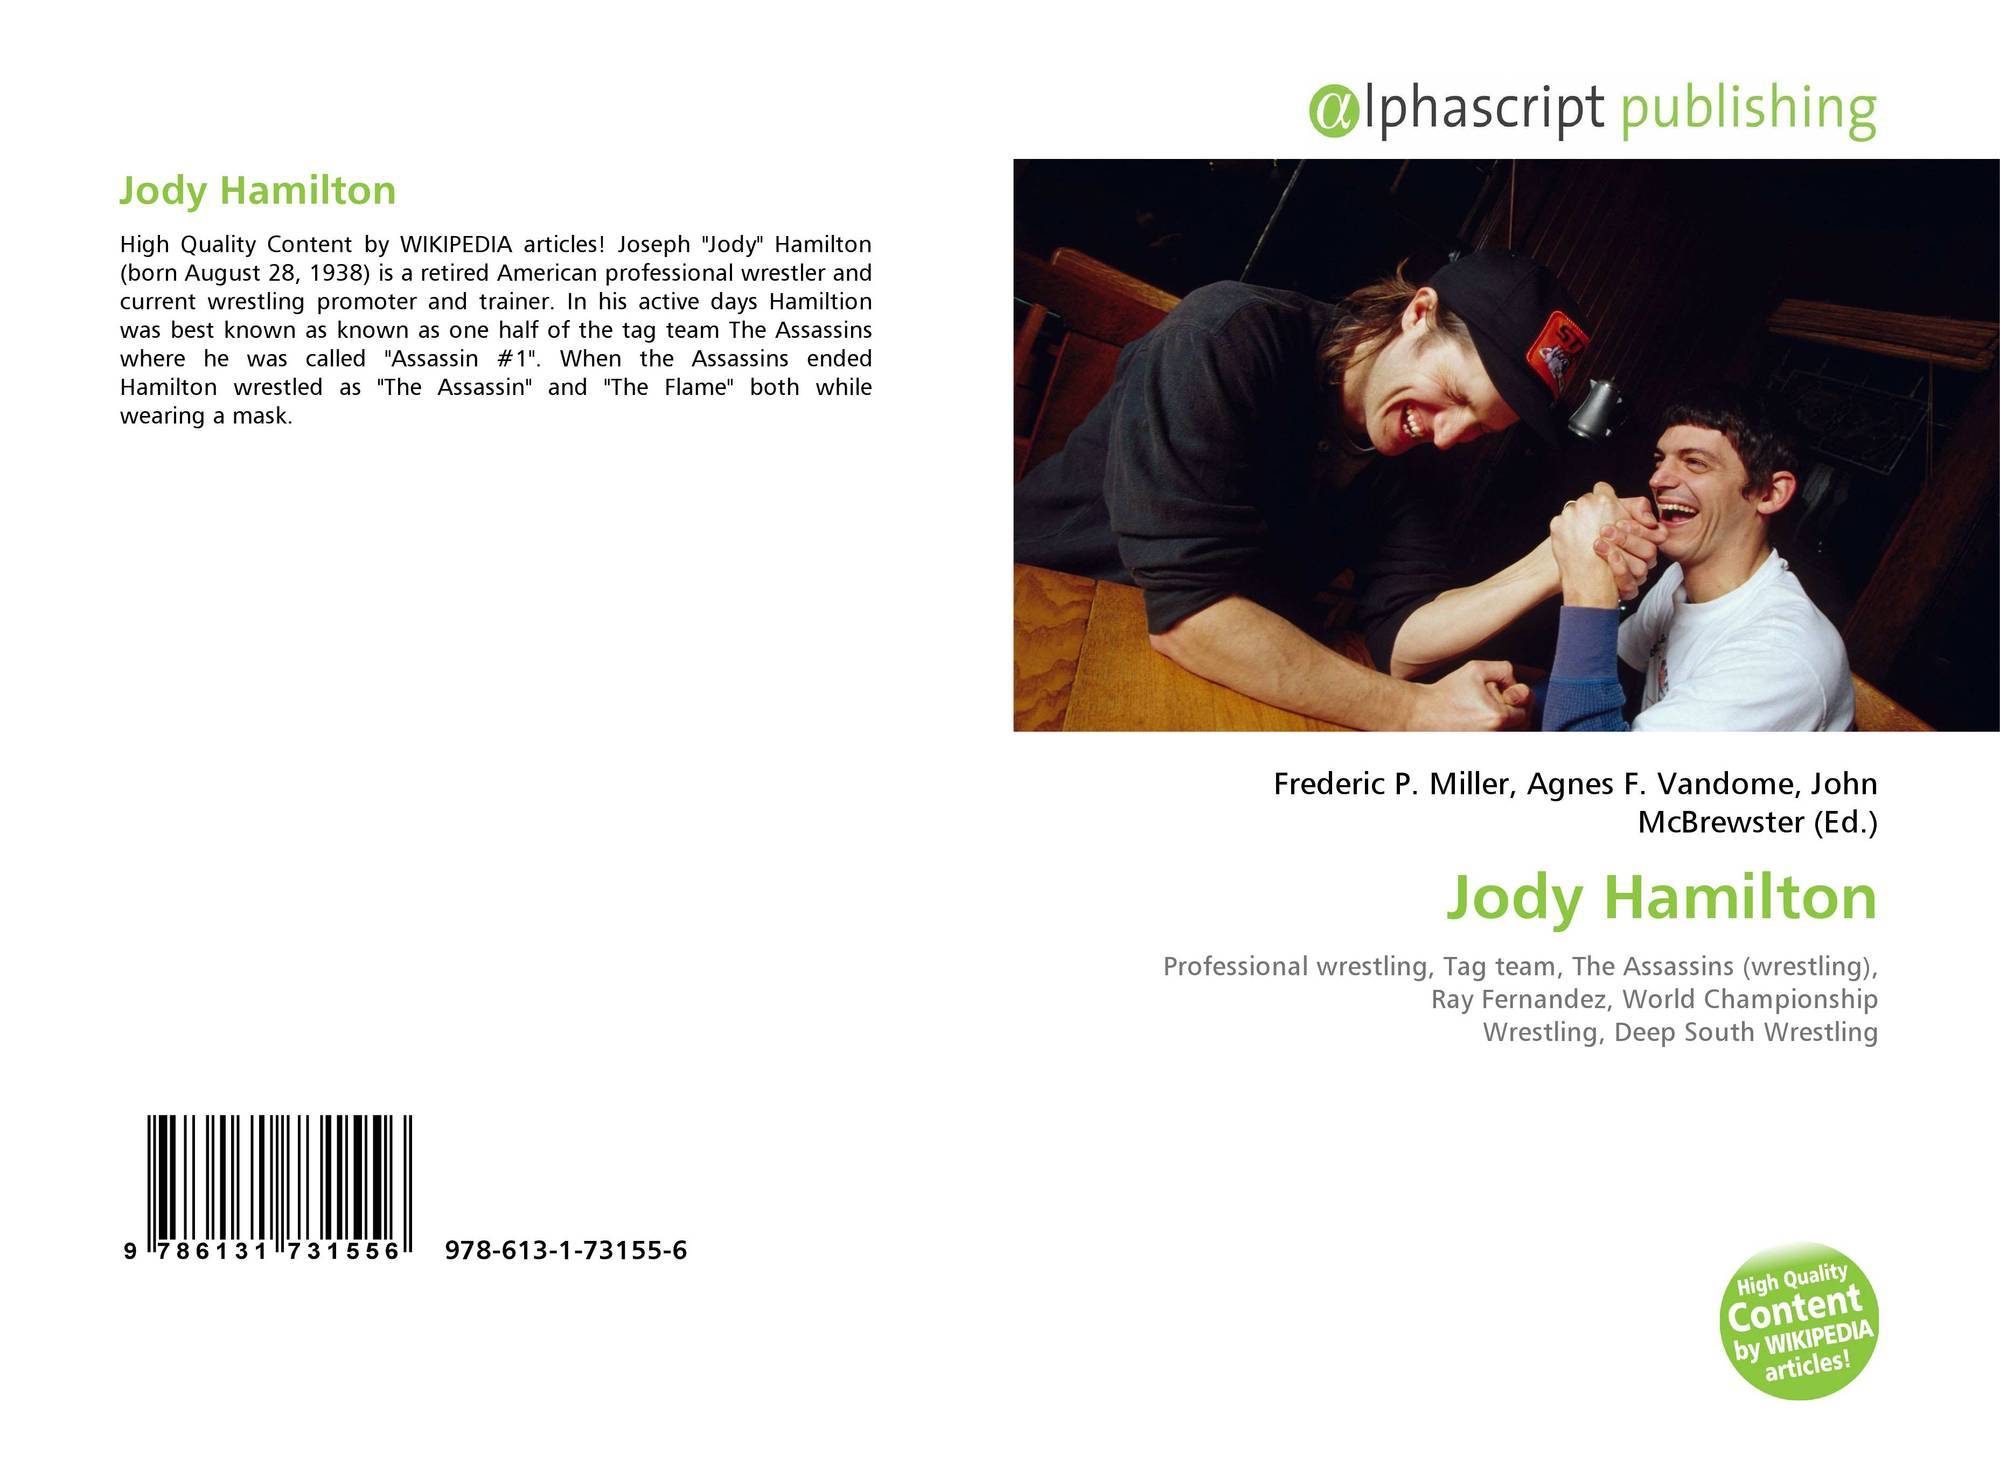 Jody Hamilton 978 613 1 73155 6 6131731551 9786131731556 Последние твиты от jody huff (@jody_hamilton78). morebooks